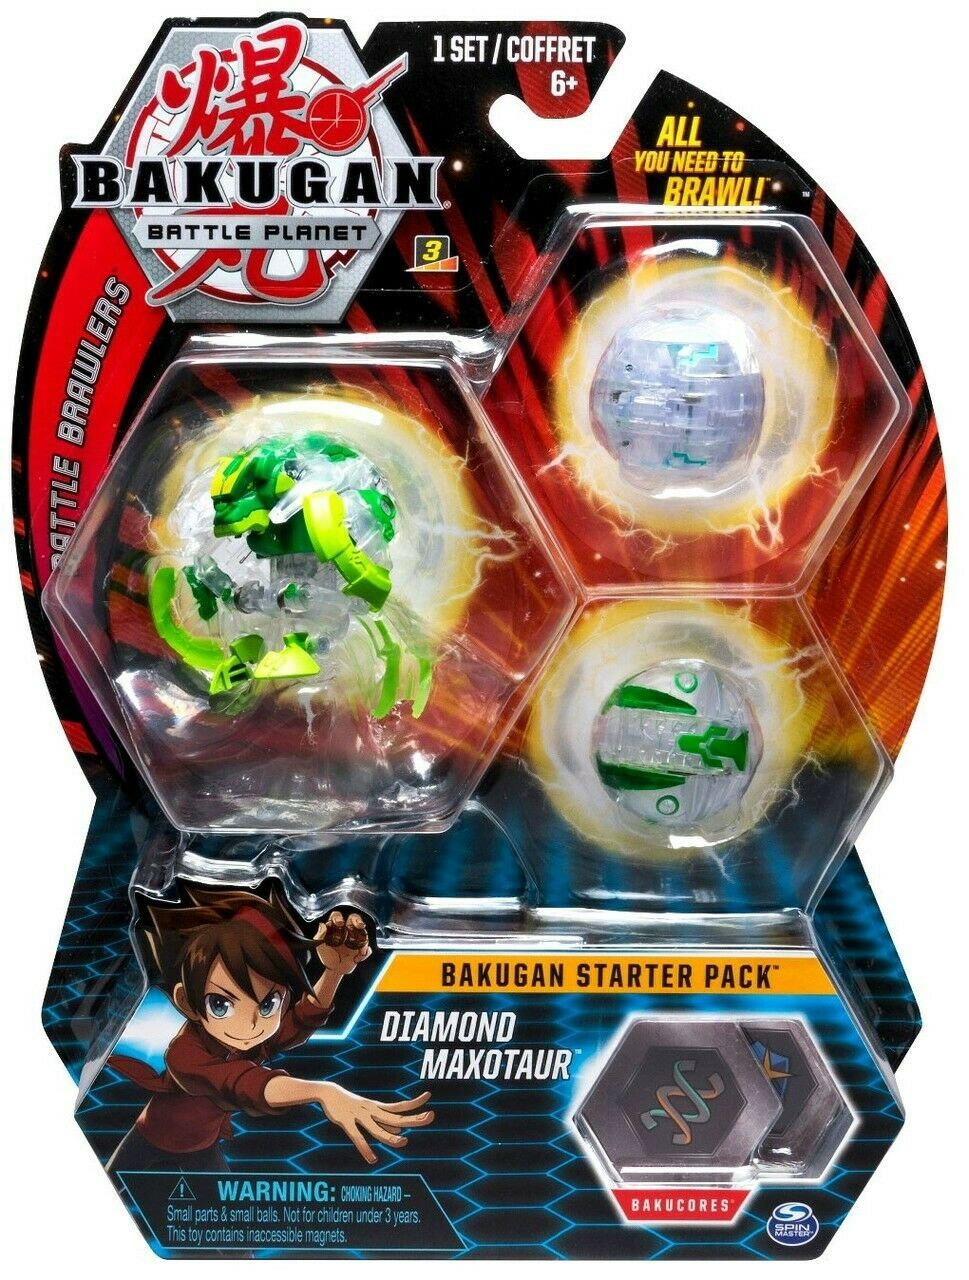 Bakugan battle Planet Diamond Maxotaur